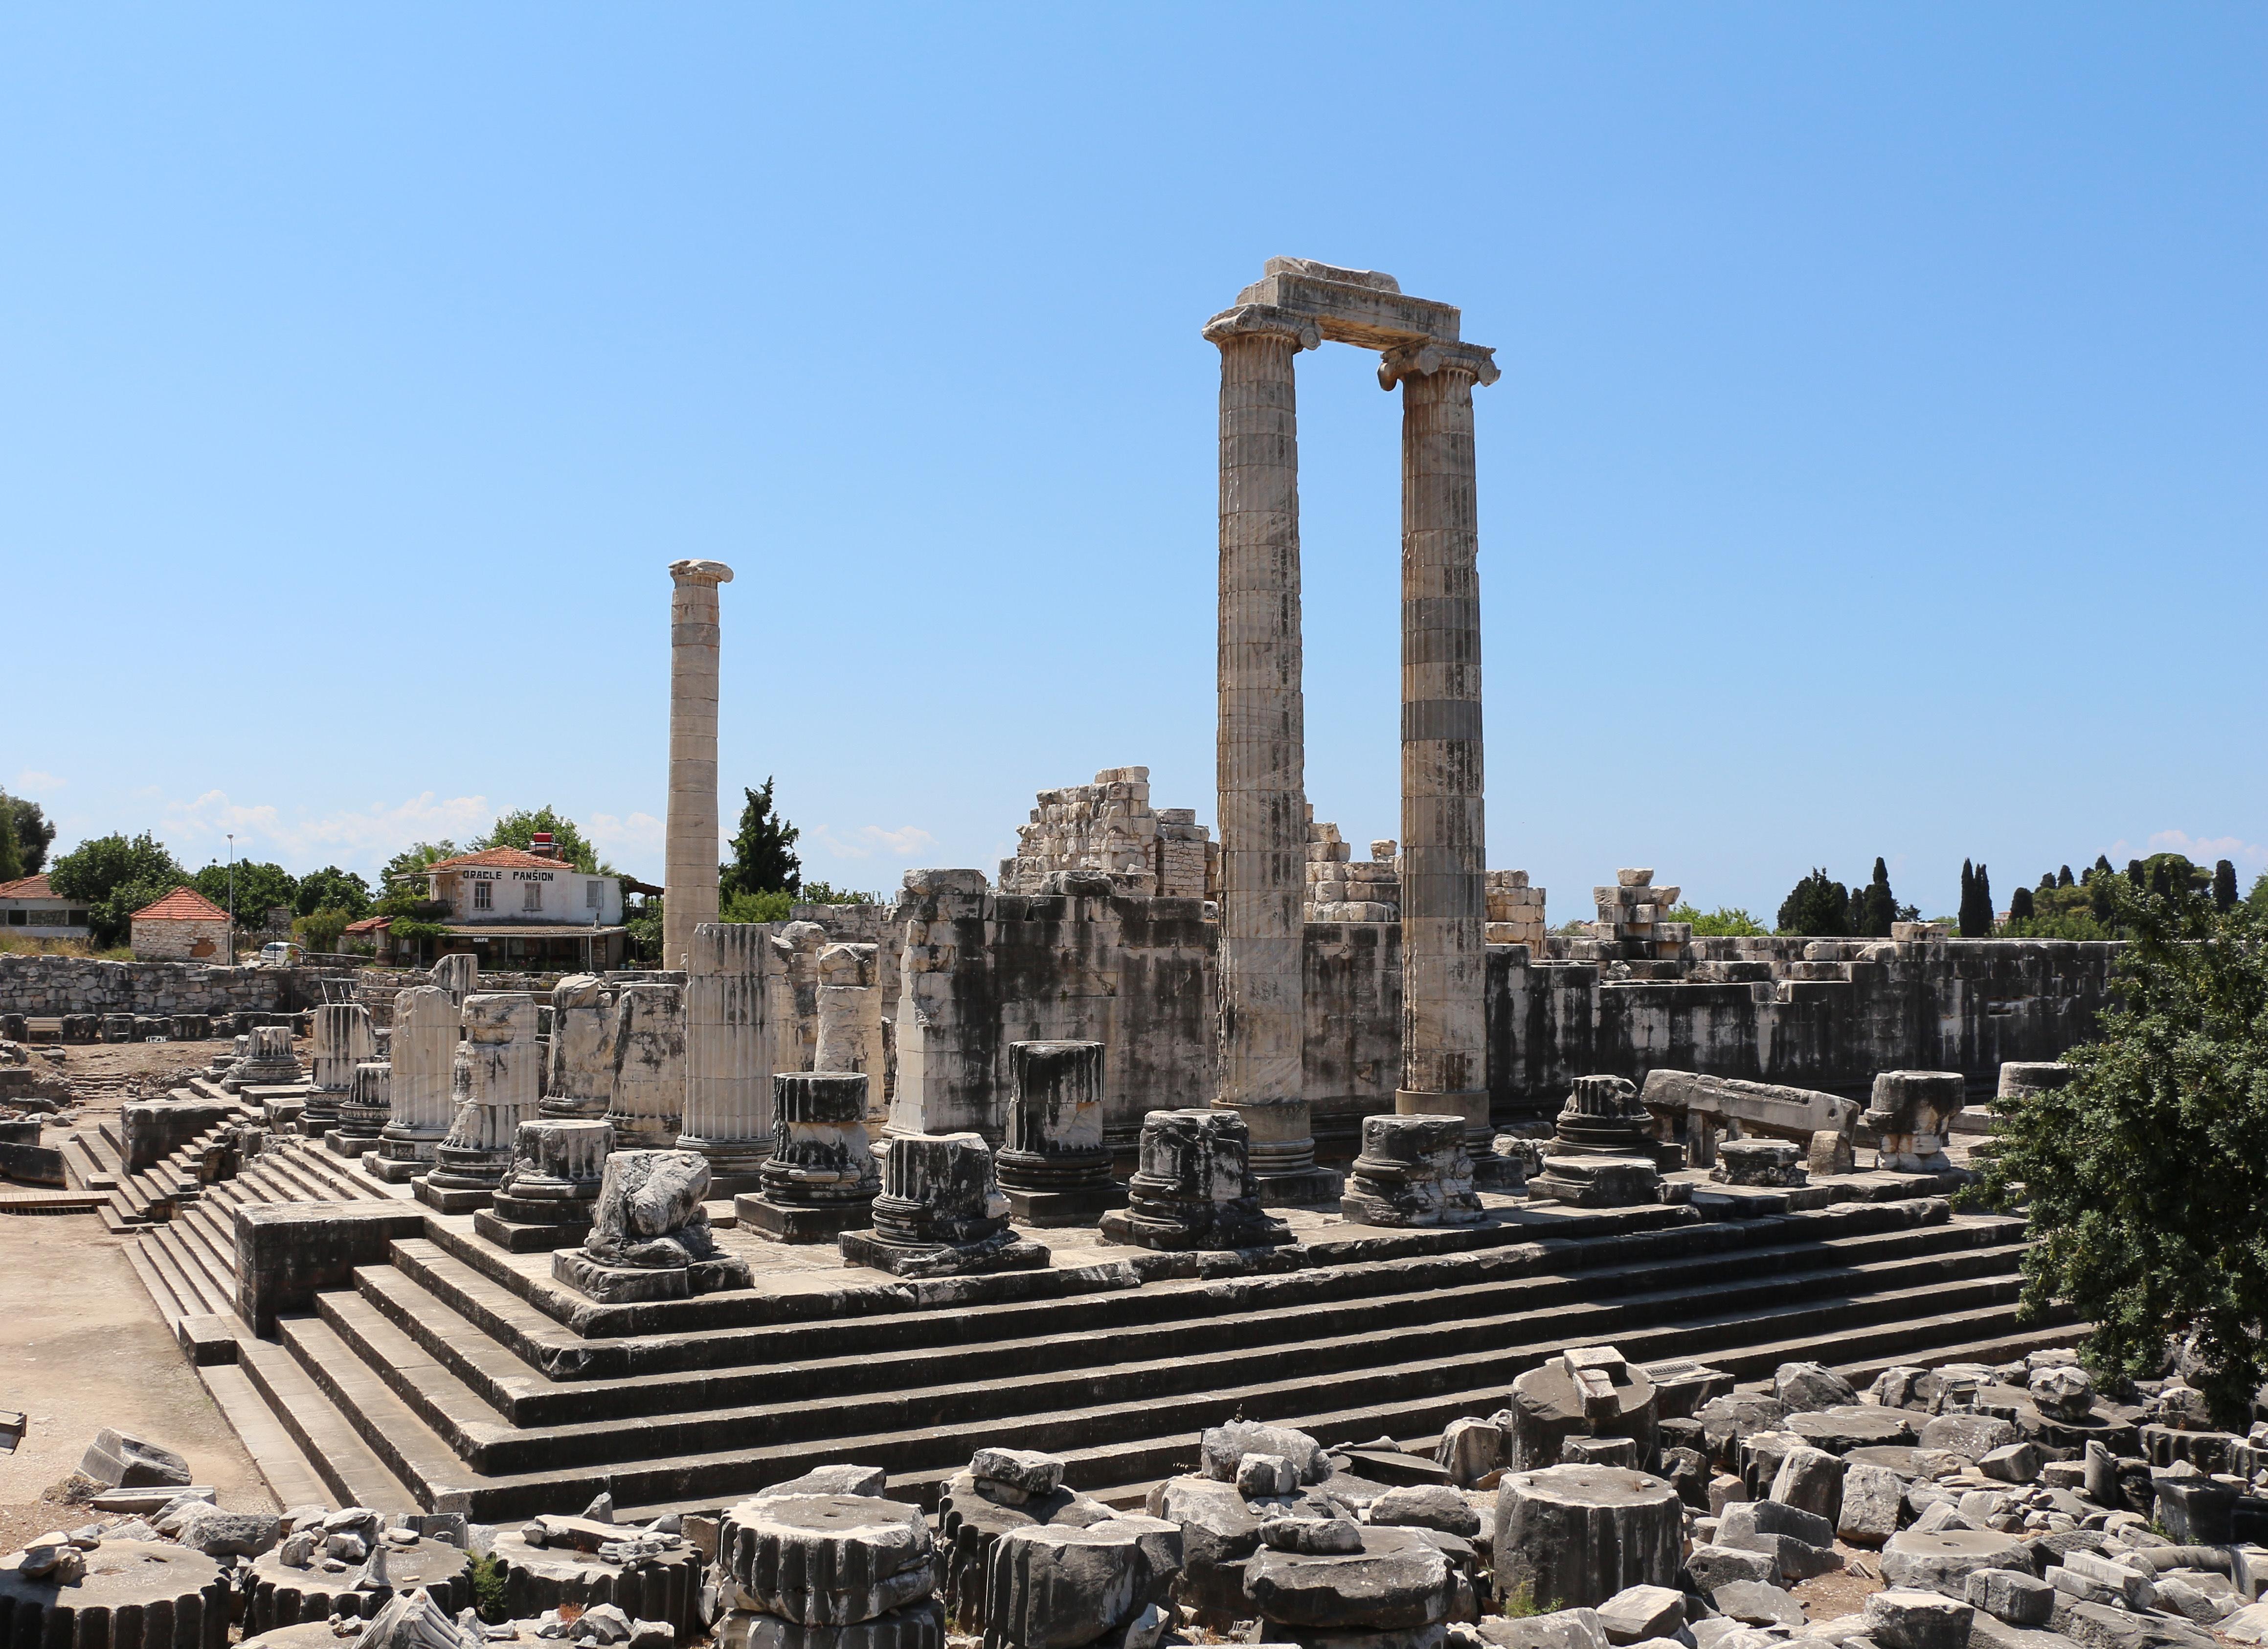 File:Temple of Apollo, Didyma 02.jpg - Wikimedia Commons